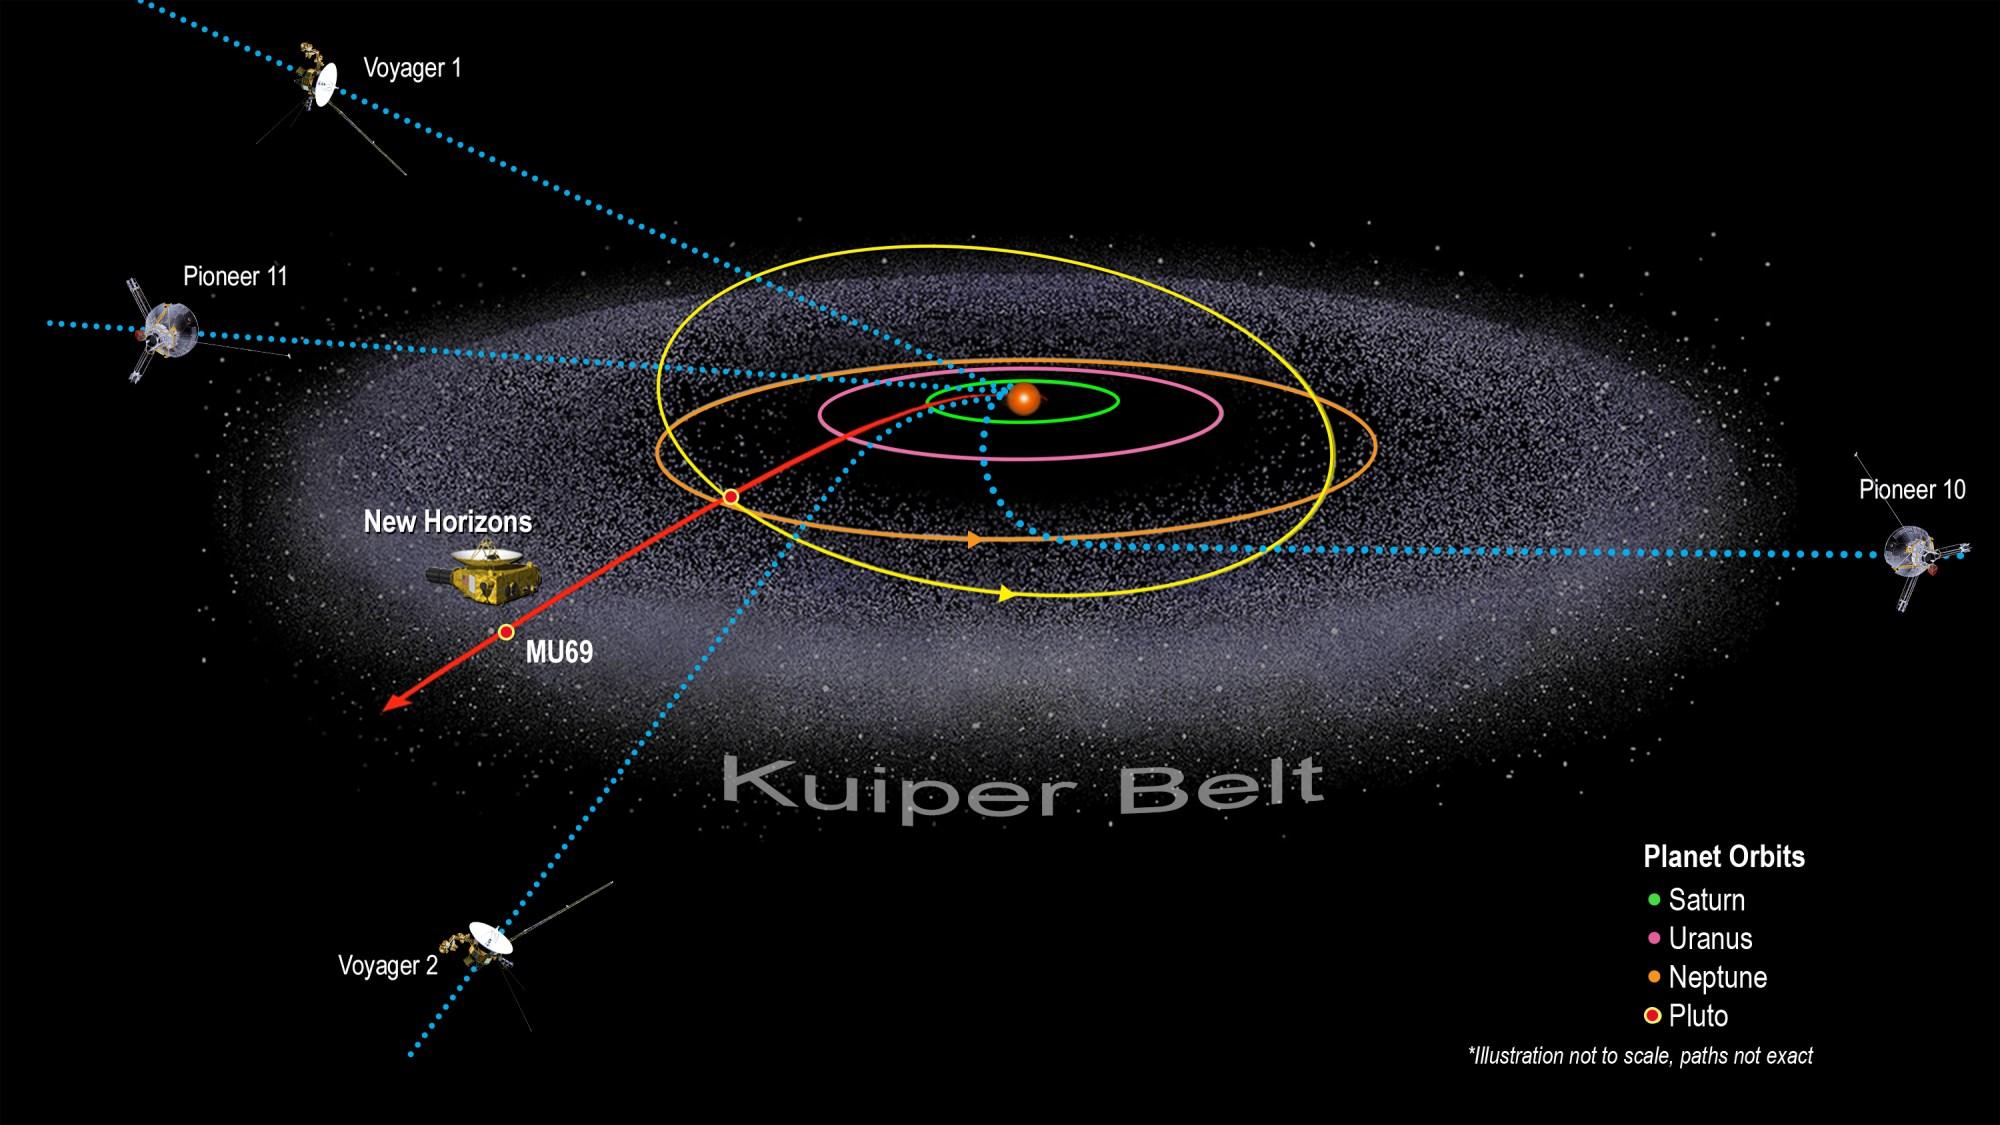 hight resolution of illustration of kuiper belt and spacecraft locations